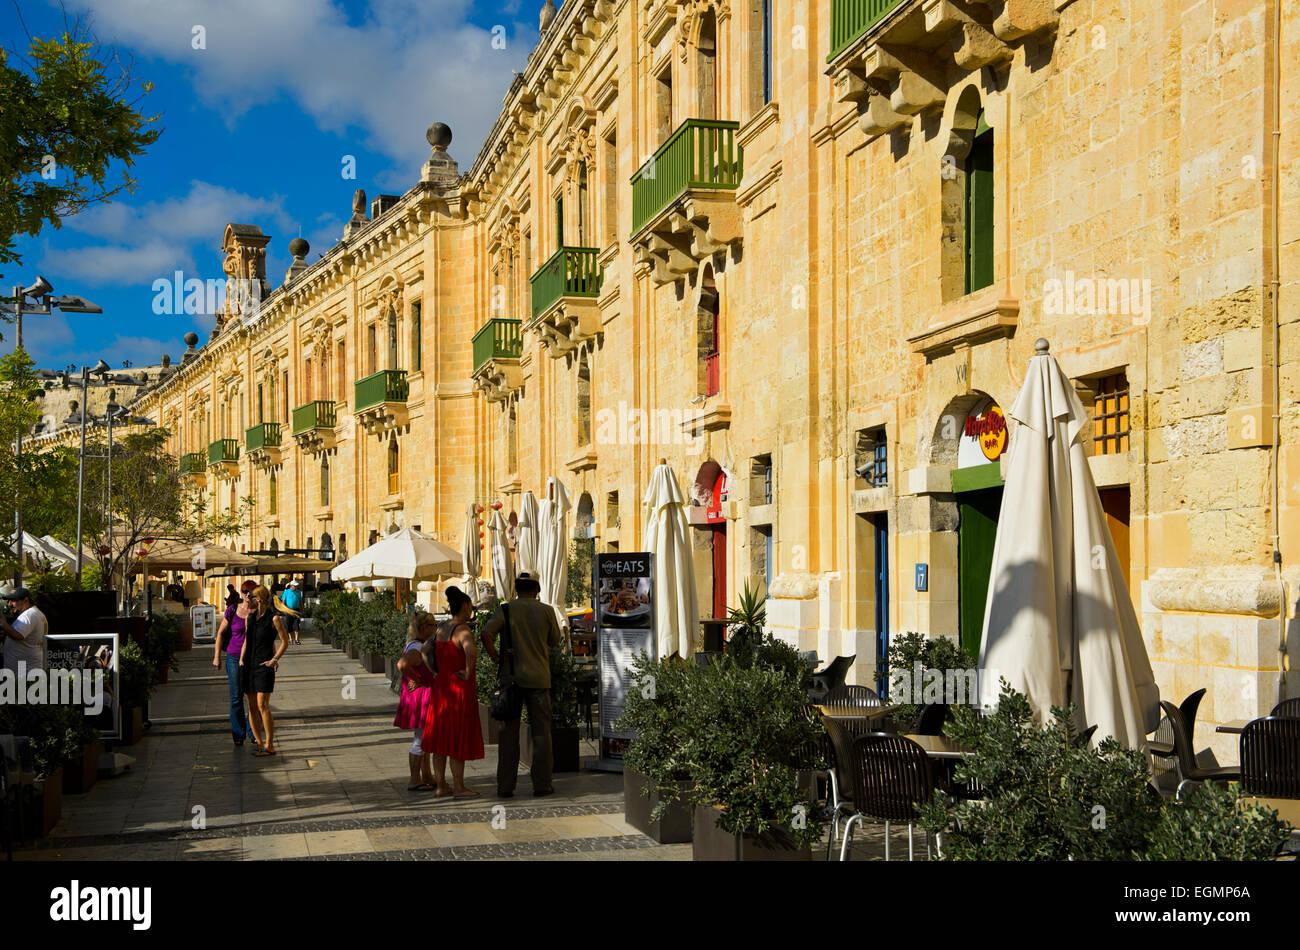 Restored historic warehouse buildings in the Valletta Waterfront, Valletta, Malta - Stock Image